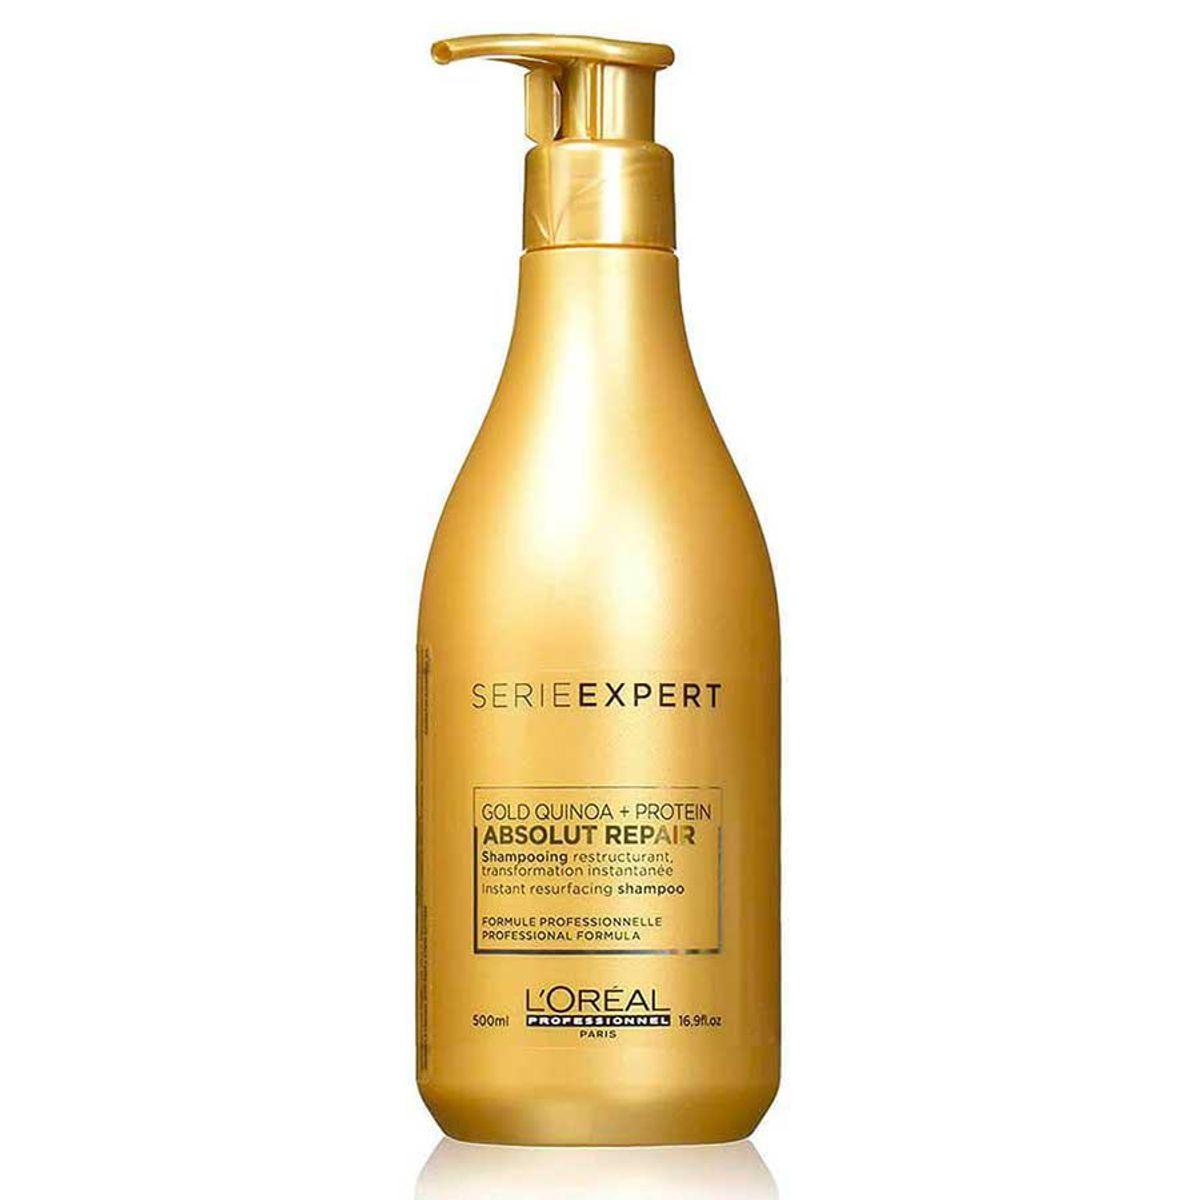 loreal instant resurfacing shampoo absolut repair